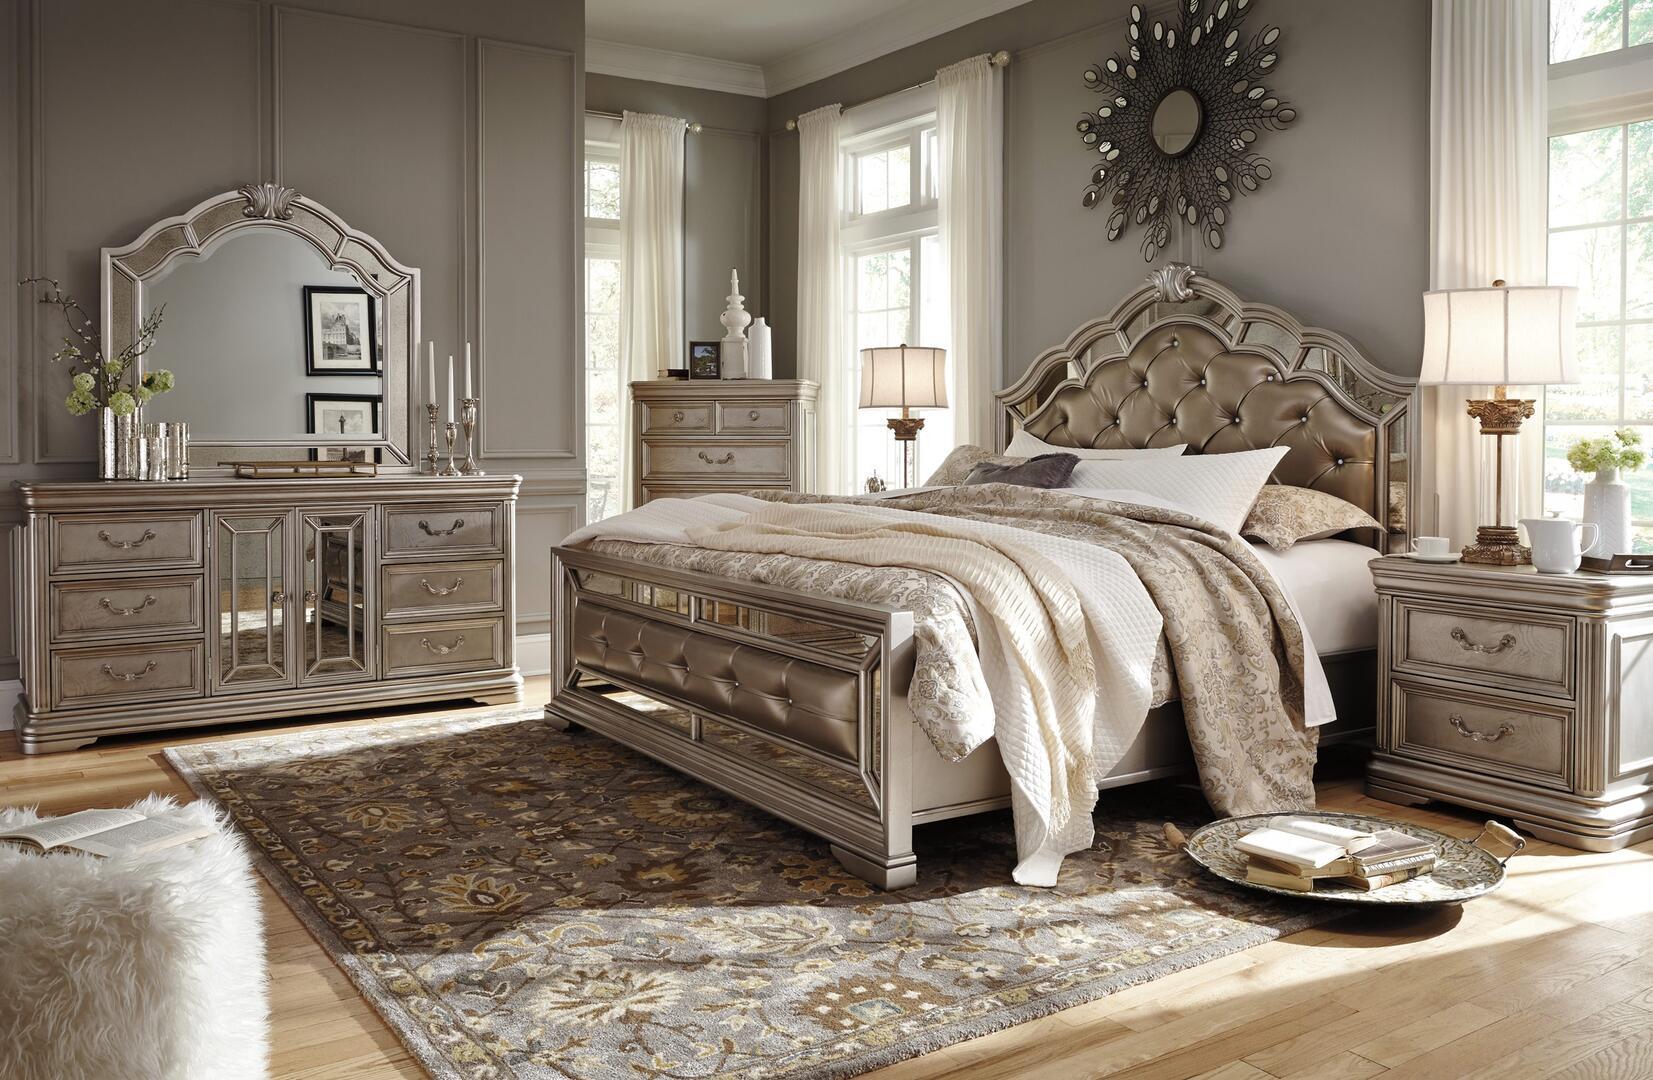 Signature Design by Ashley Birlanny 4 Piece California King Size Bedroom Set